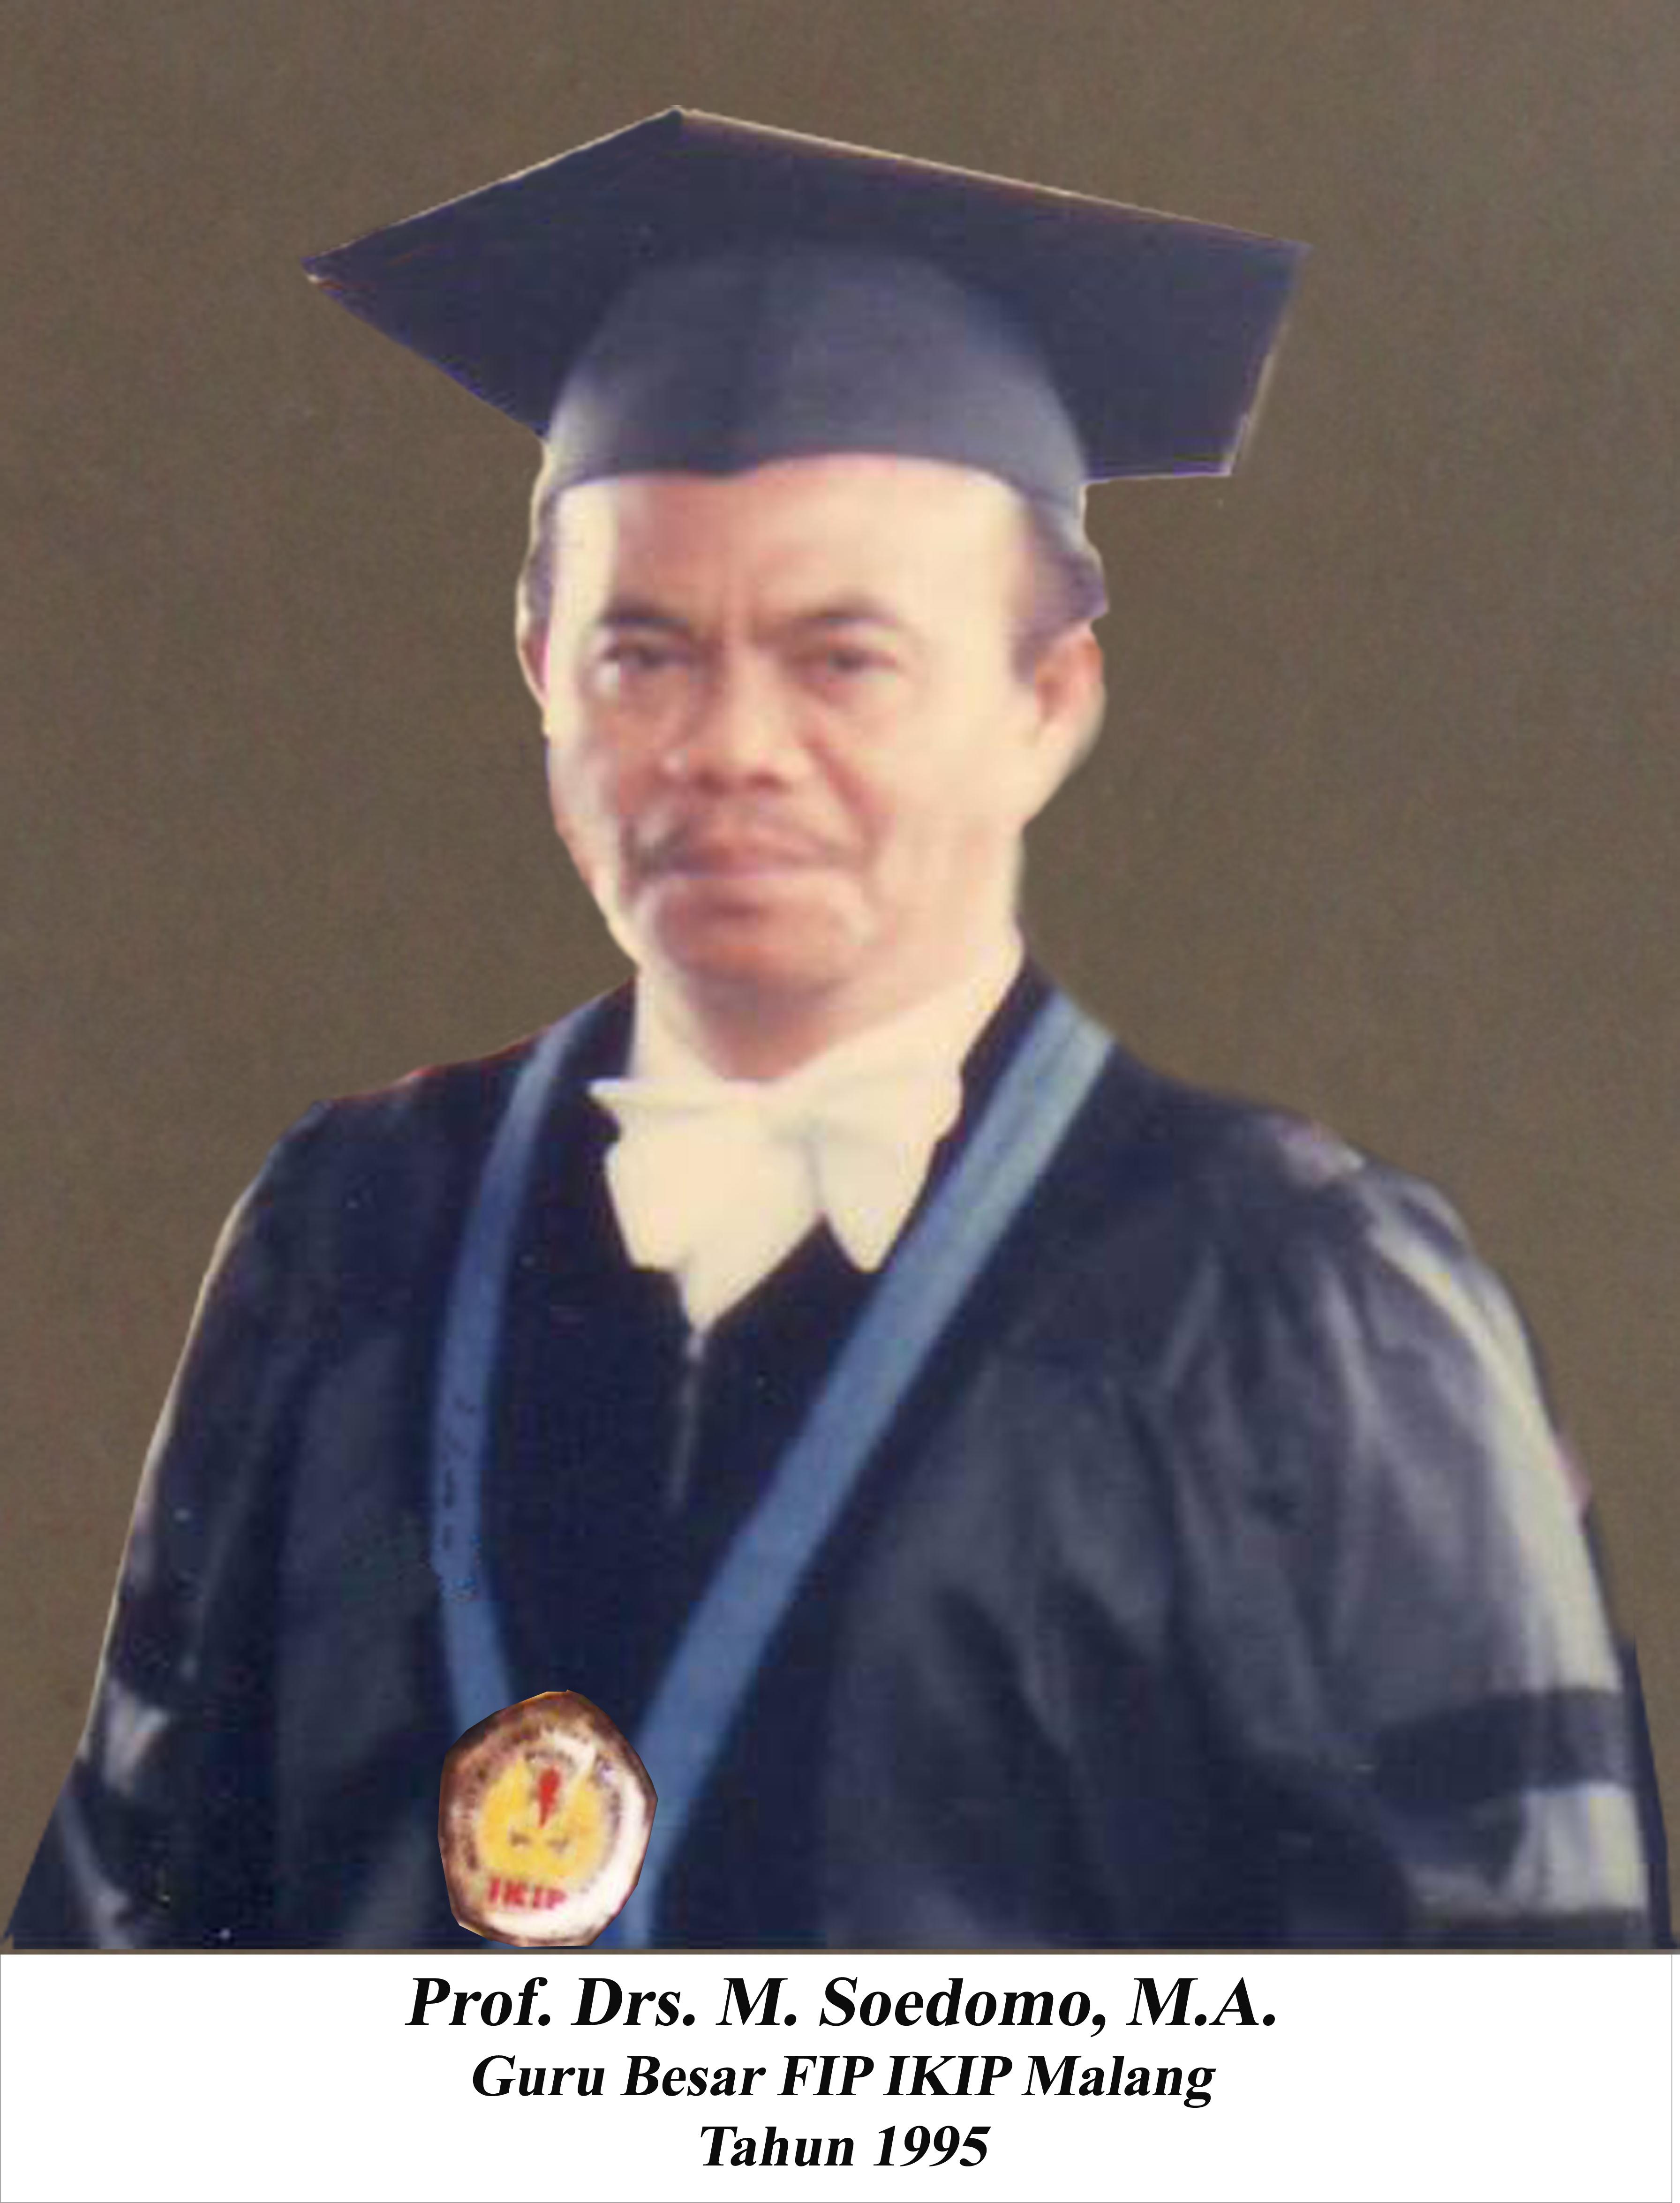 Prof. H.M. Soedomo